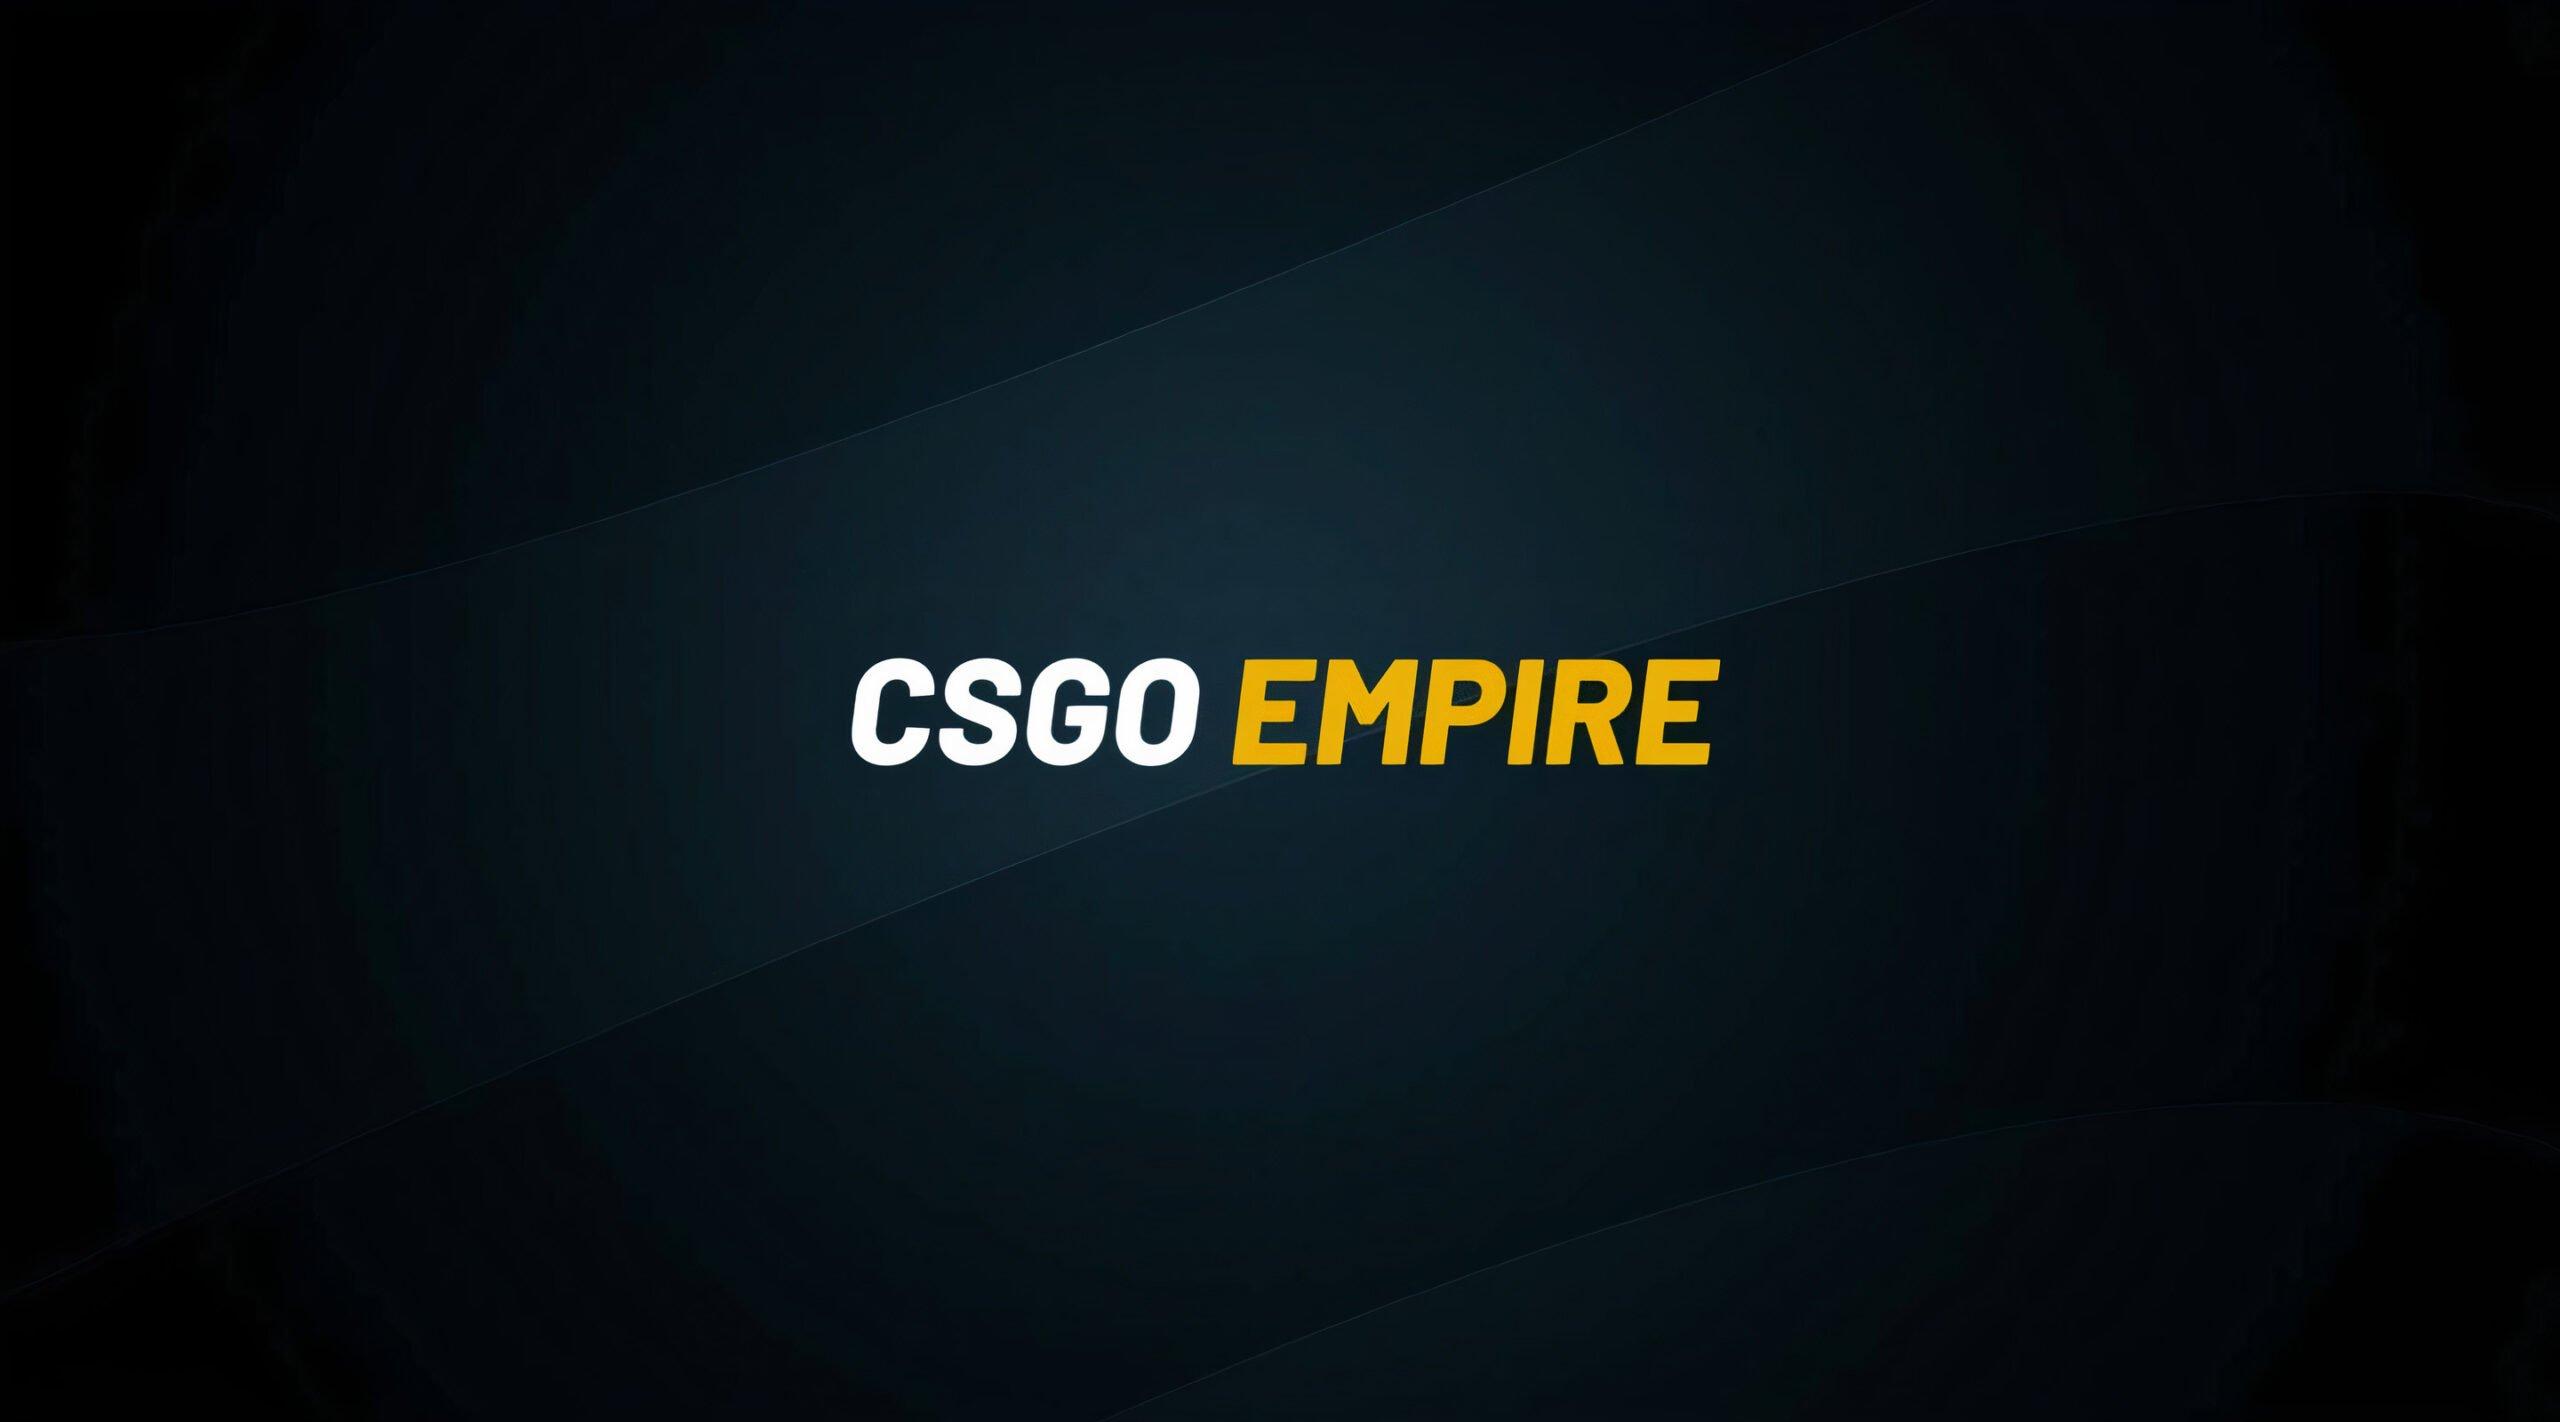 A closer look into CSGOempire